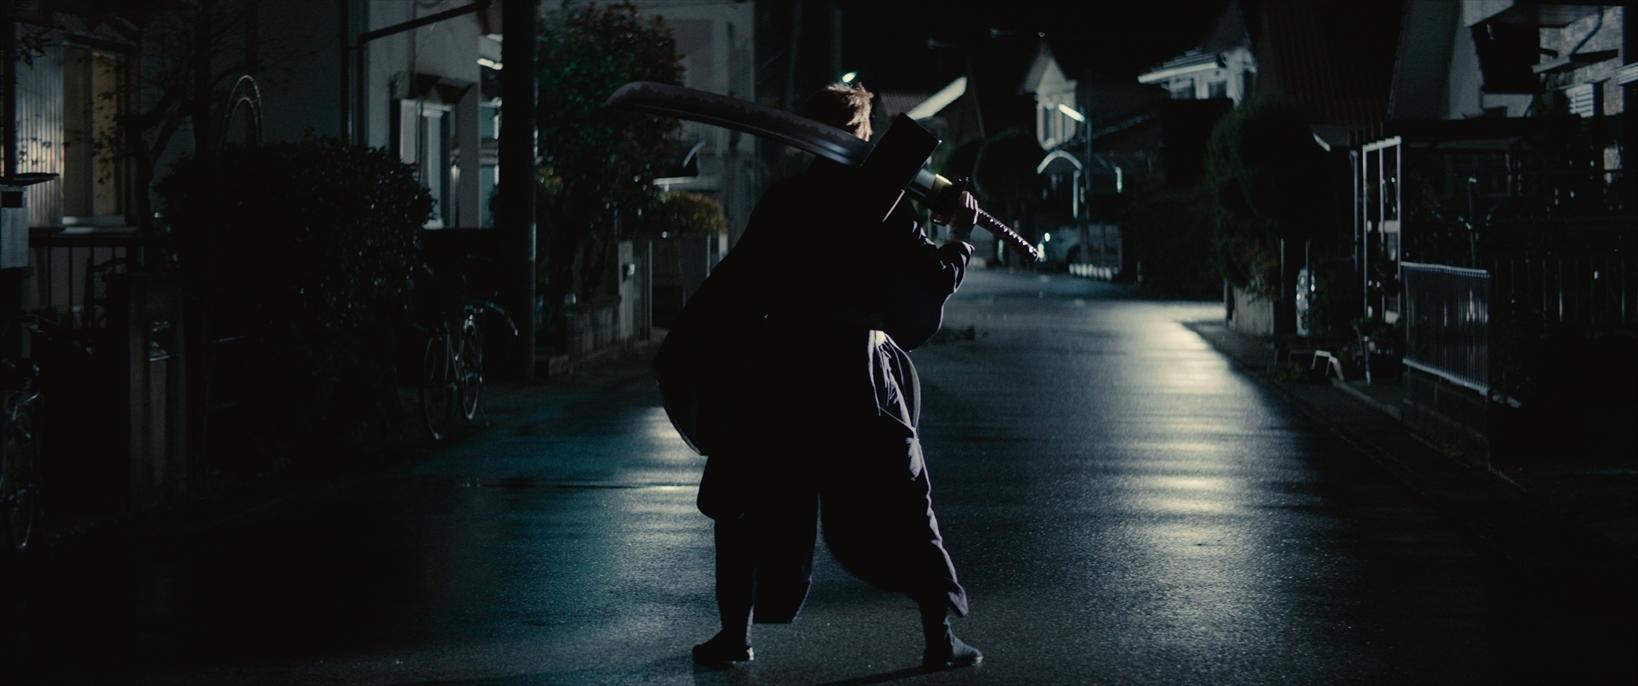 (C)久保帯人/集英社 (C)2018映画「BLEACH」製作委員会